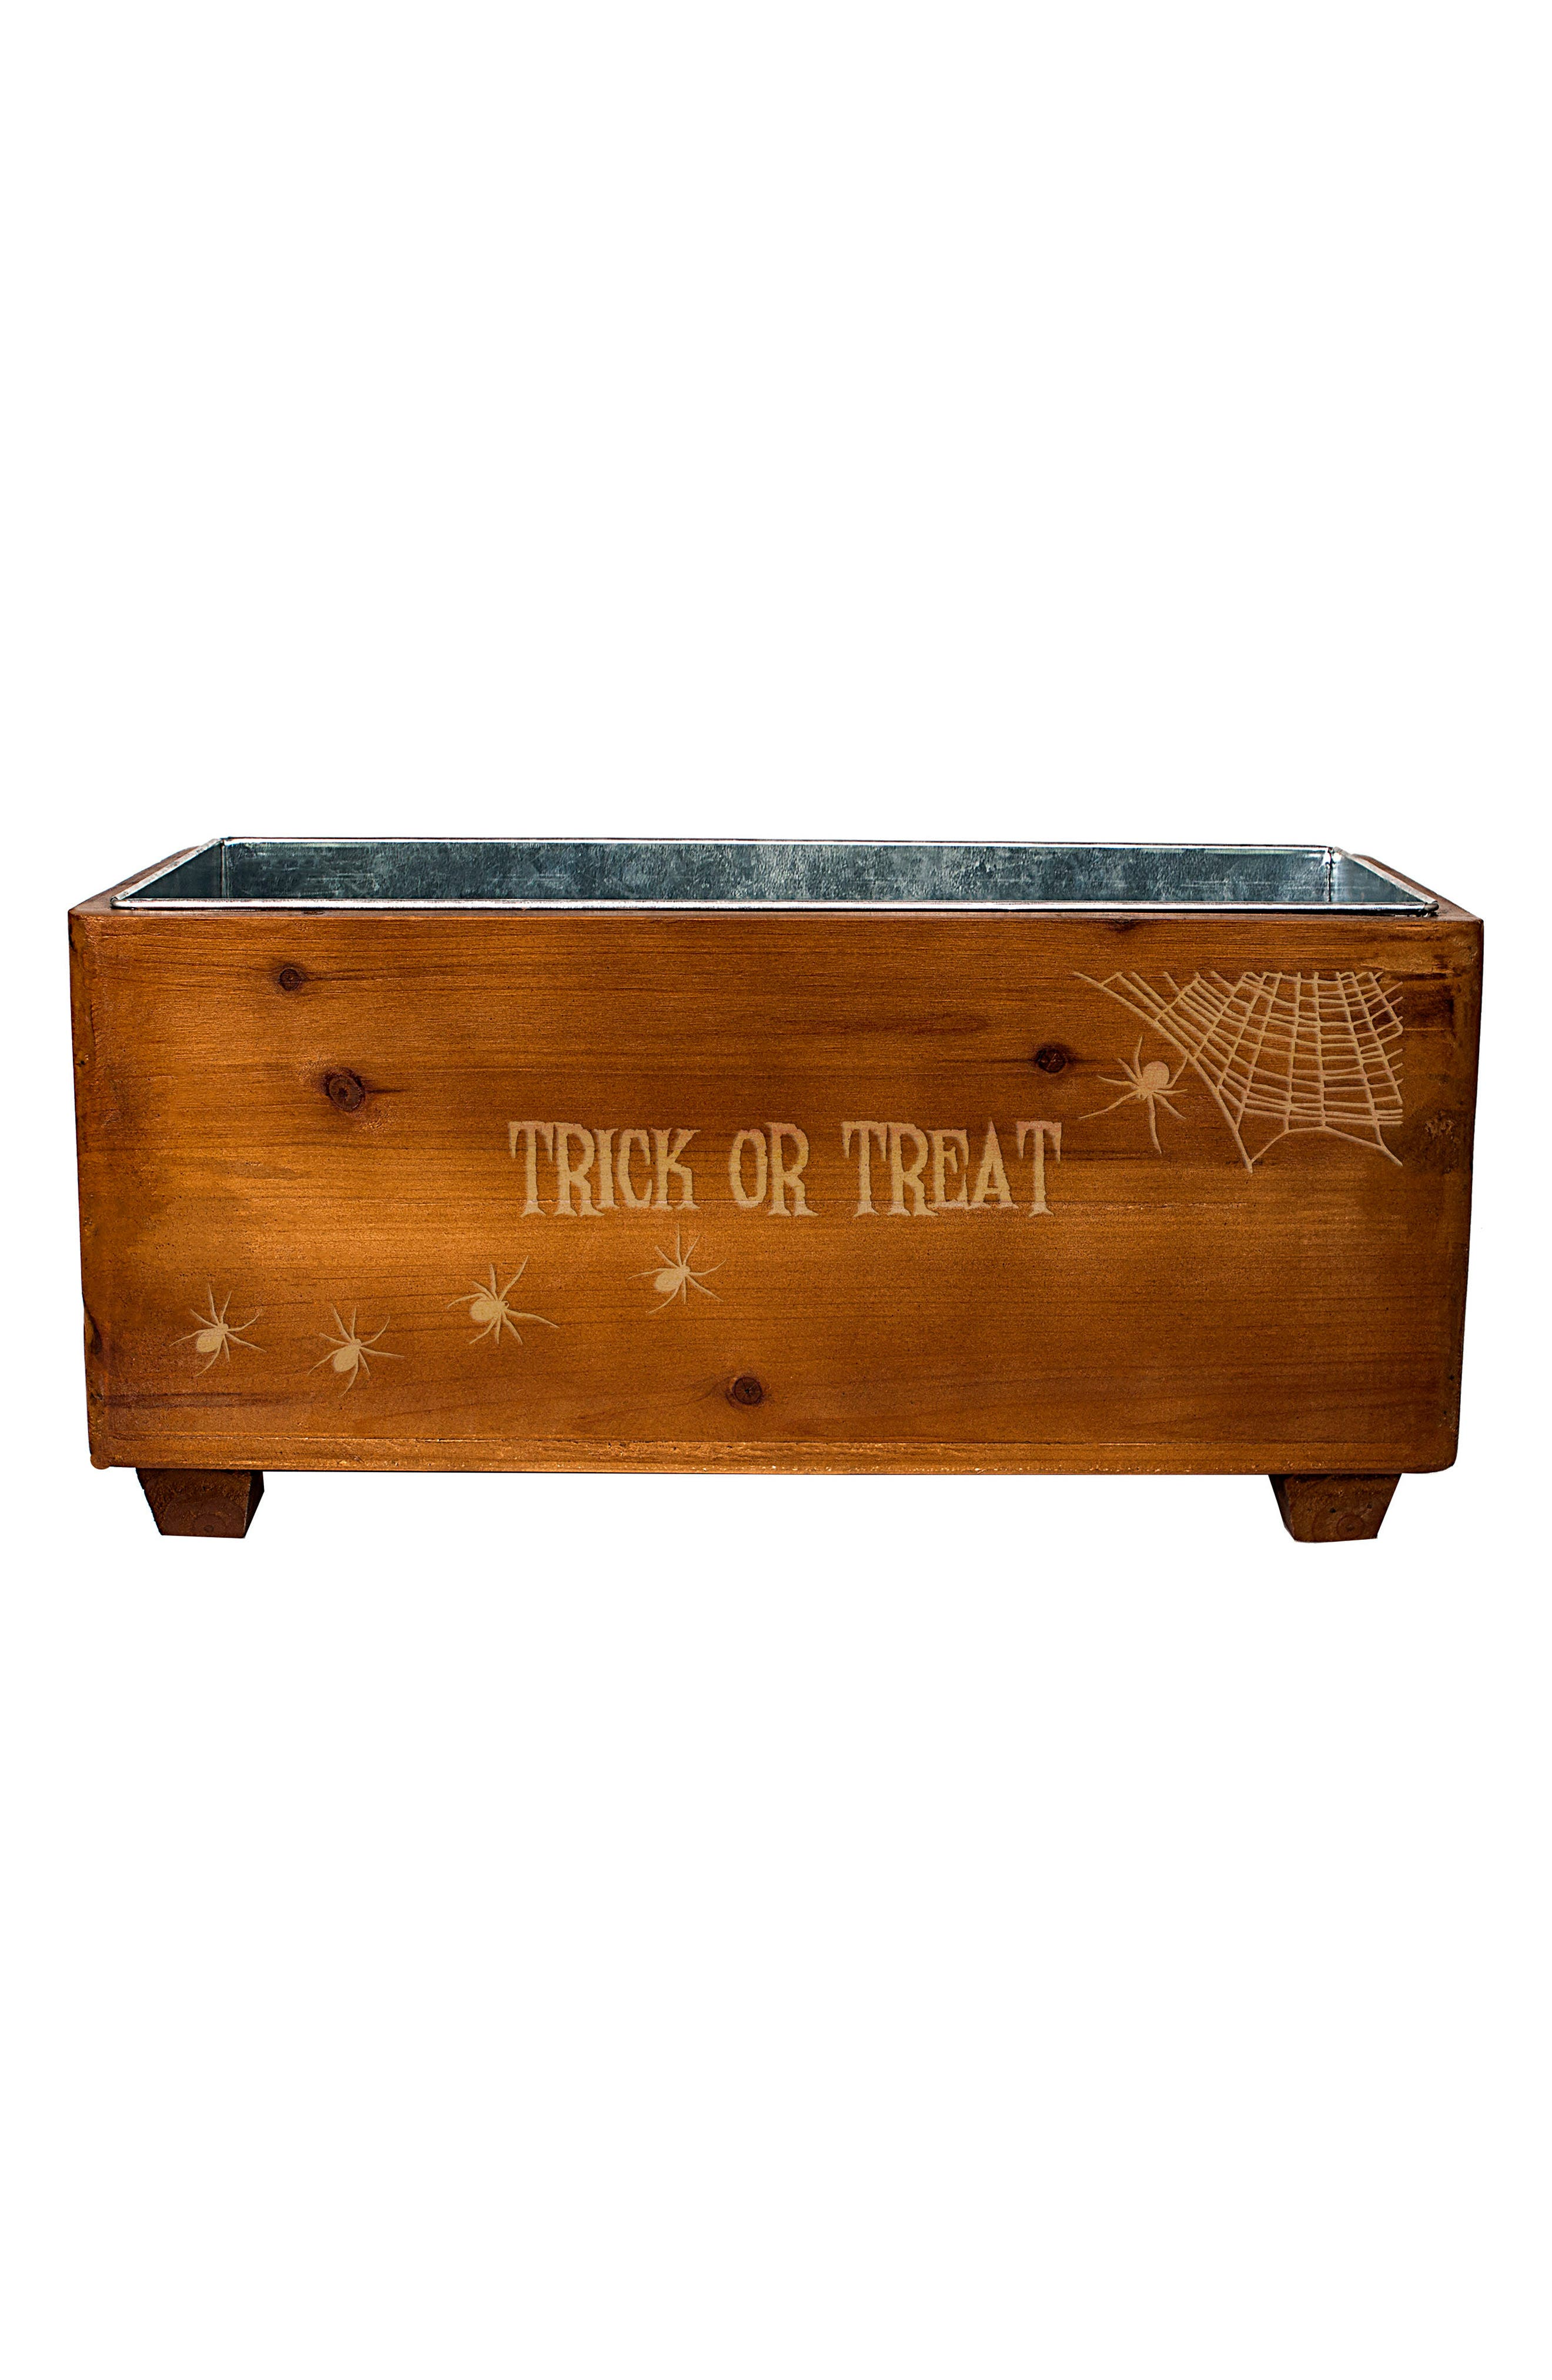 Trick or Treat Wood Wine Trough,                             Main thumbnail 1, color,                             200